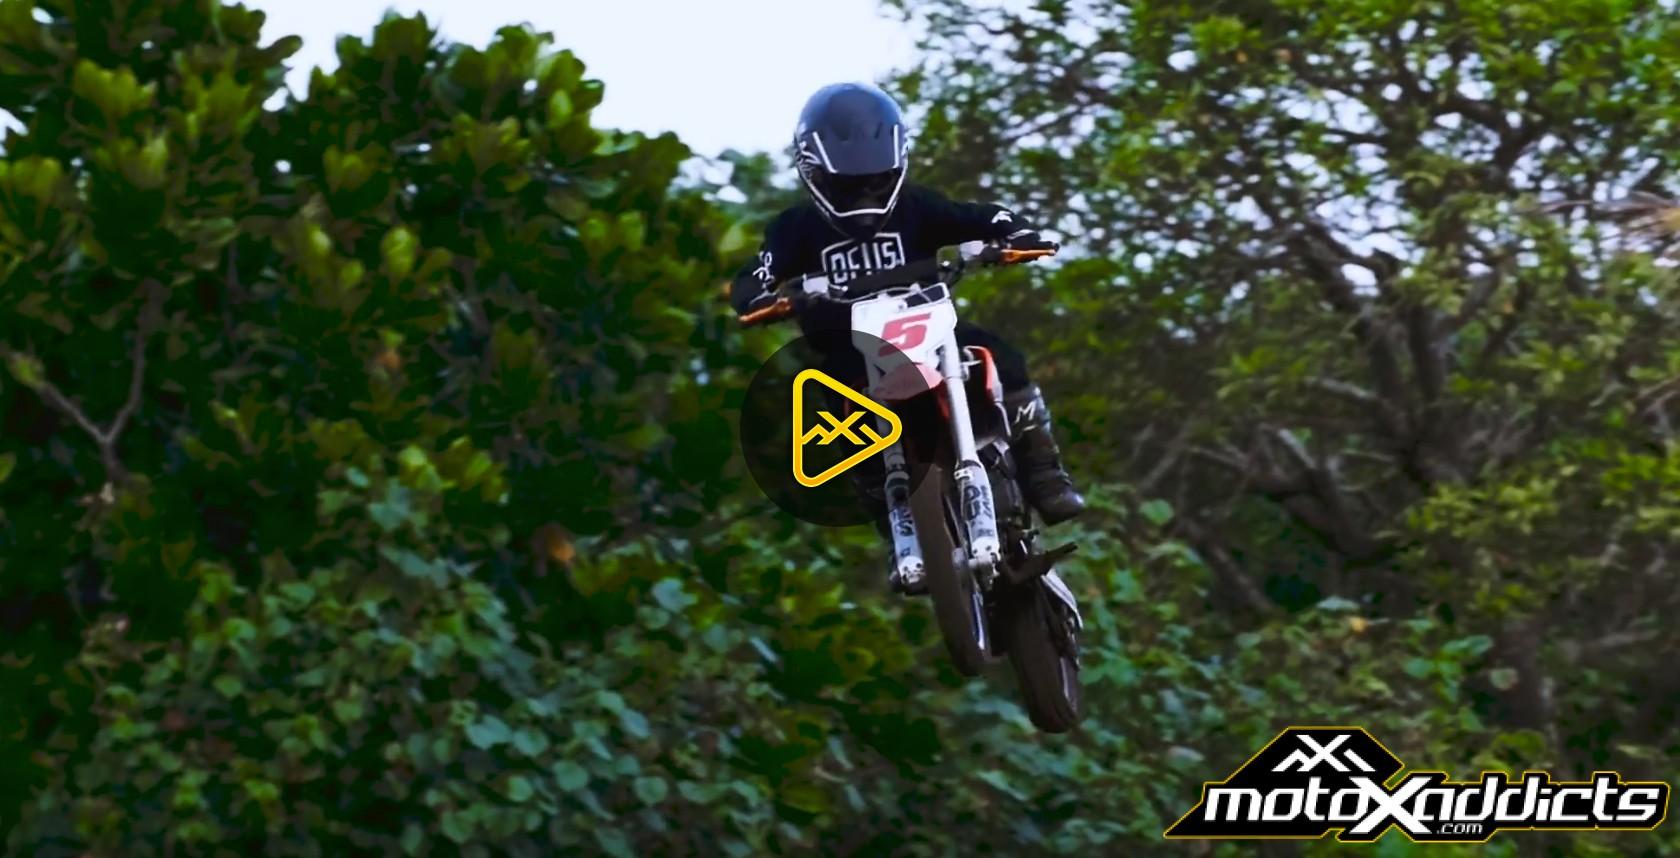 Flying Machine Stories EP: 004 – Deus: Live Big, Ride Happy